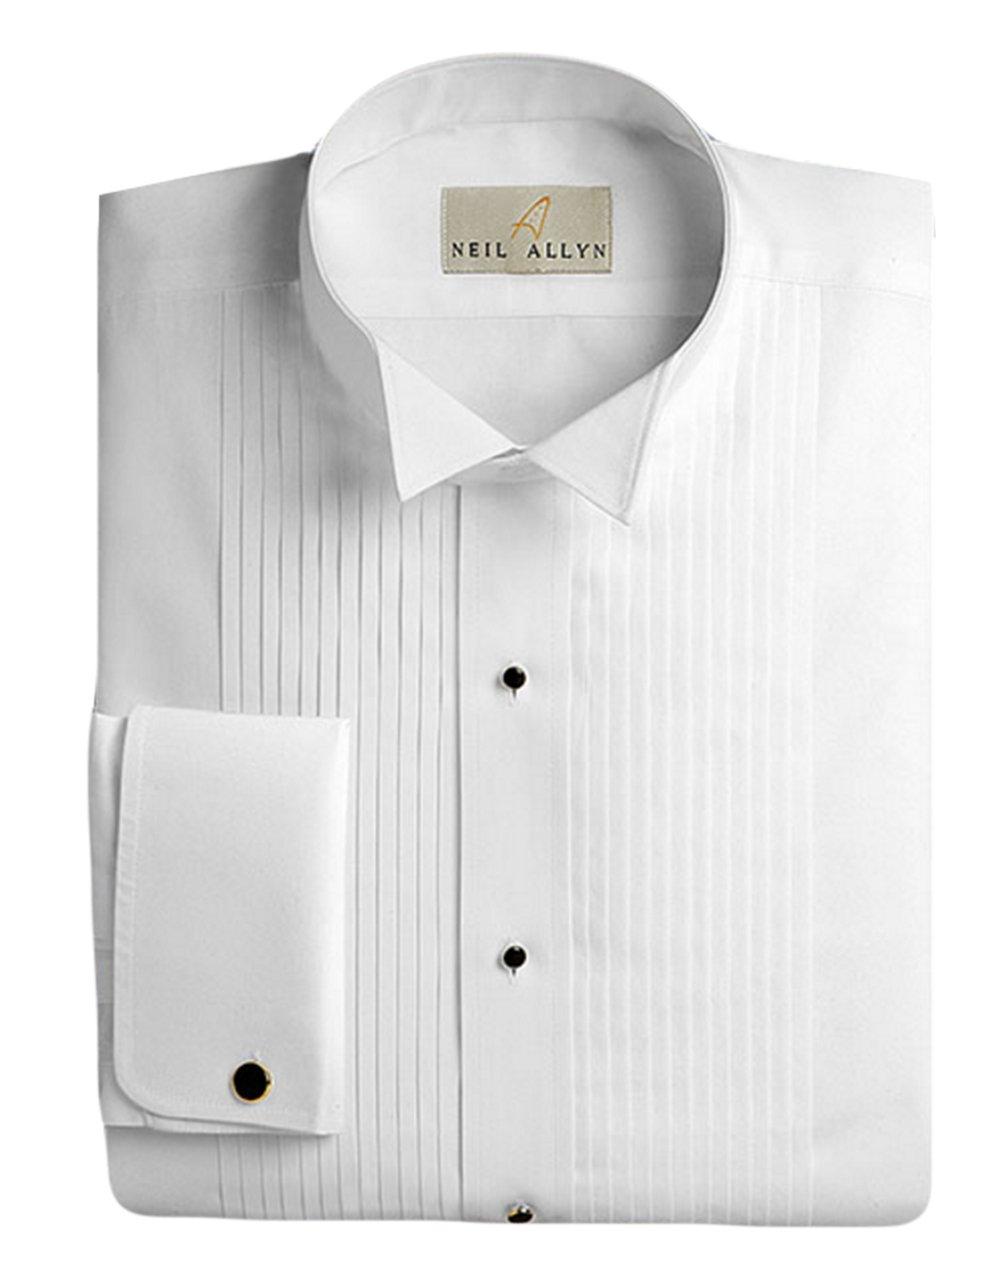 Neil Allyn Men's Tuxedo Shirt 100% Cotton 1/4'' Pleat Wing Collar, 14.5 (34/35)